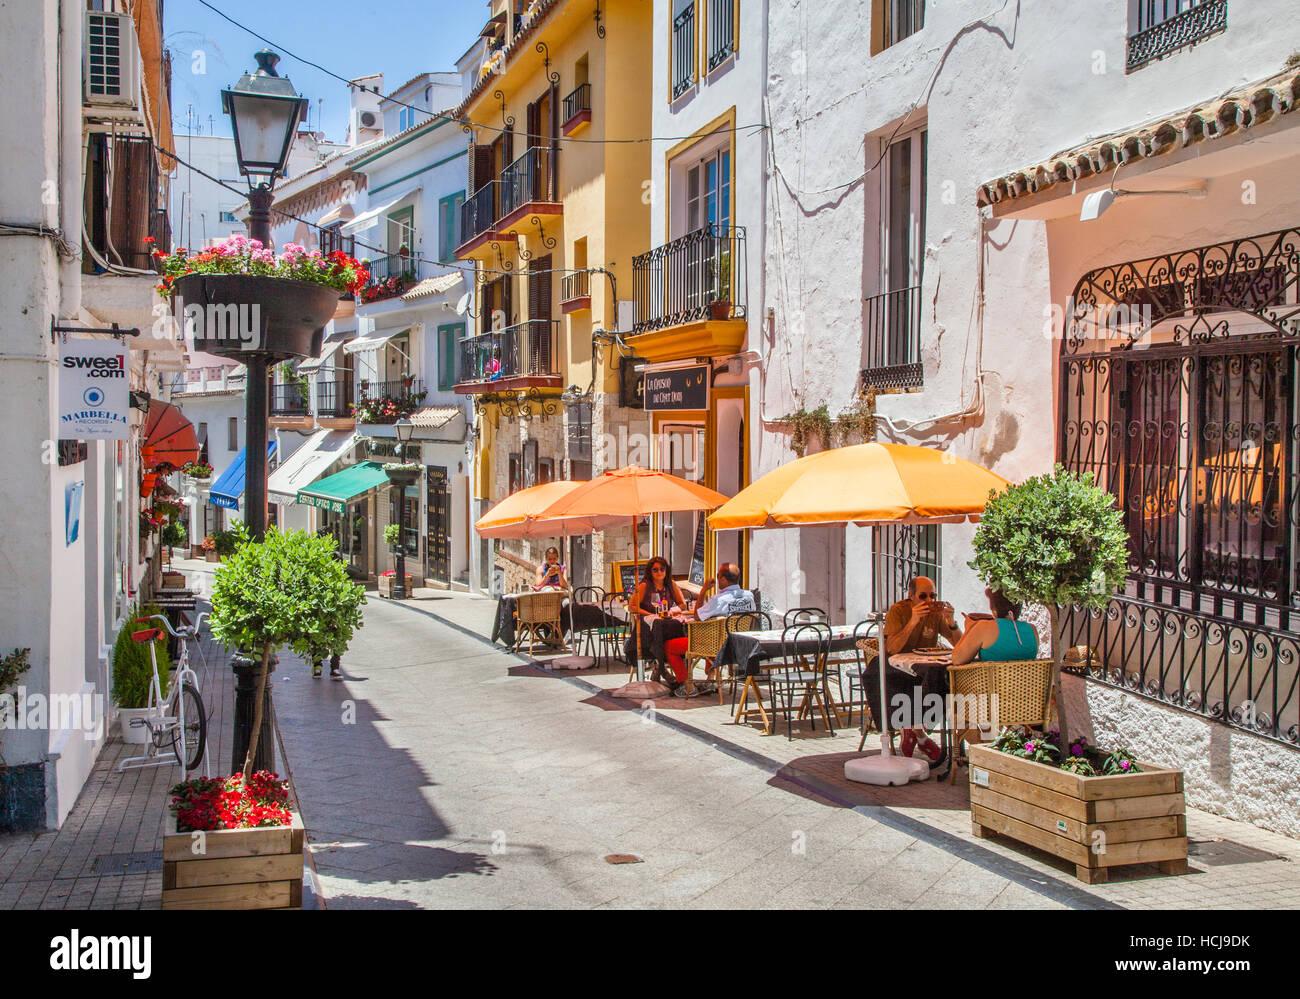 Spain, Andalusia, Province of Malaga, Costa del Sol, Marbella, Calle Peral at Casco Antiguo, Marbella Old Town - Stock Image